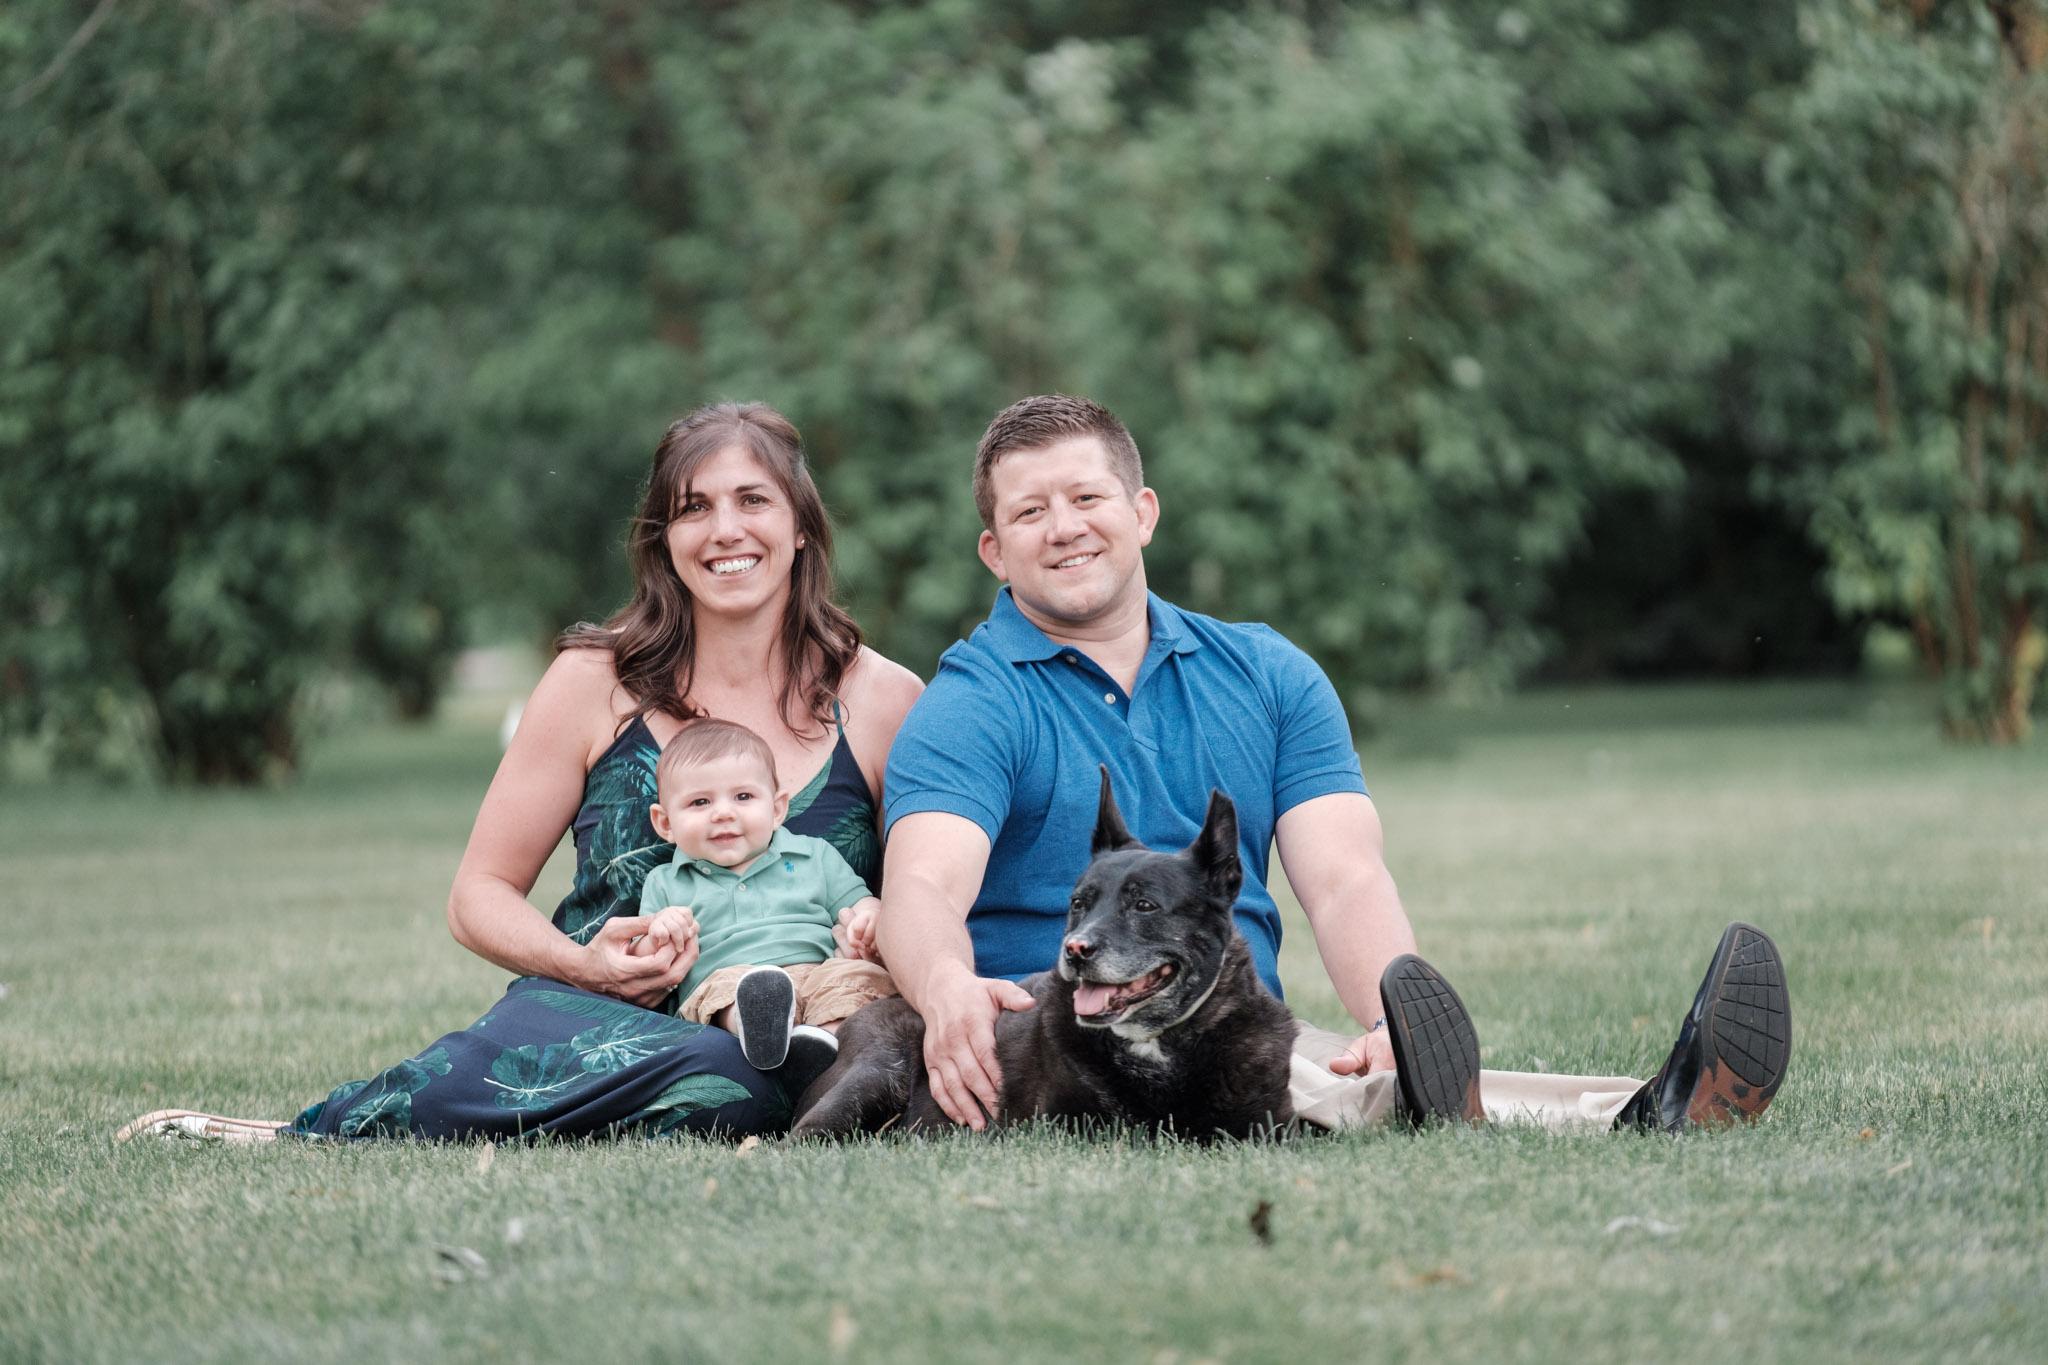 2018 BAP Vandiver Family Photos Roscoe-16.jpg